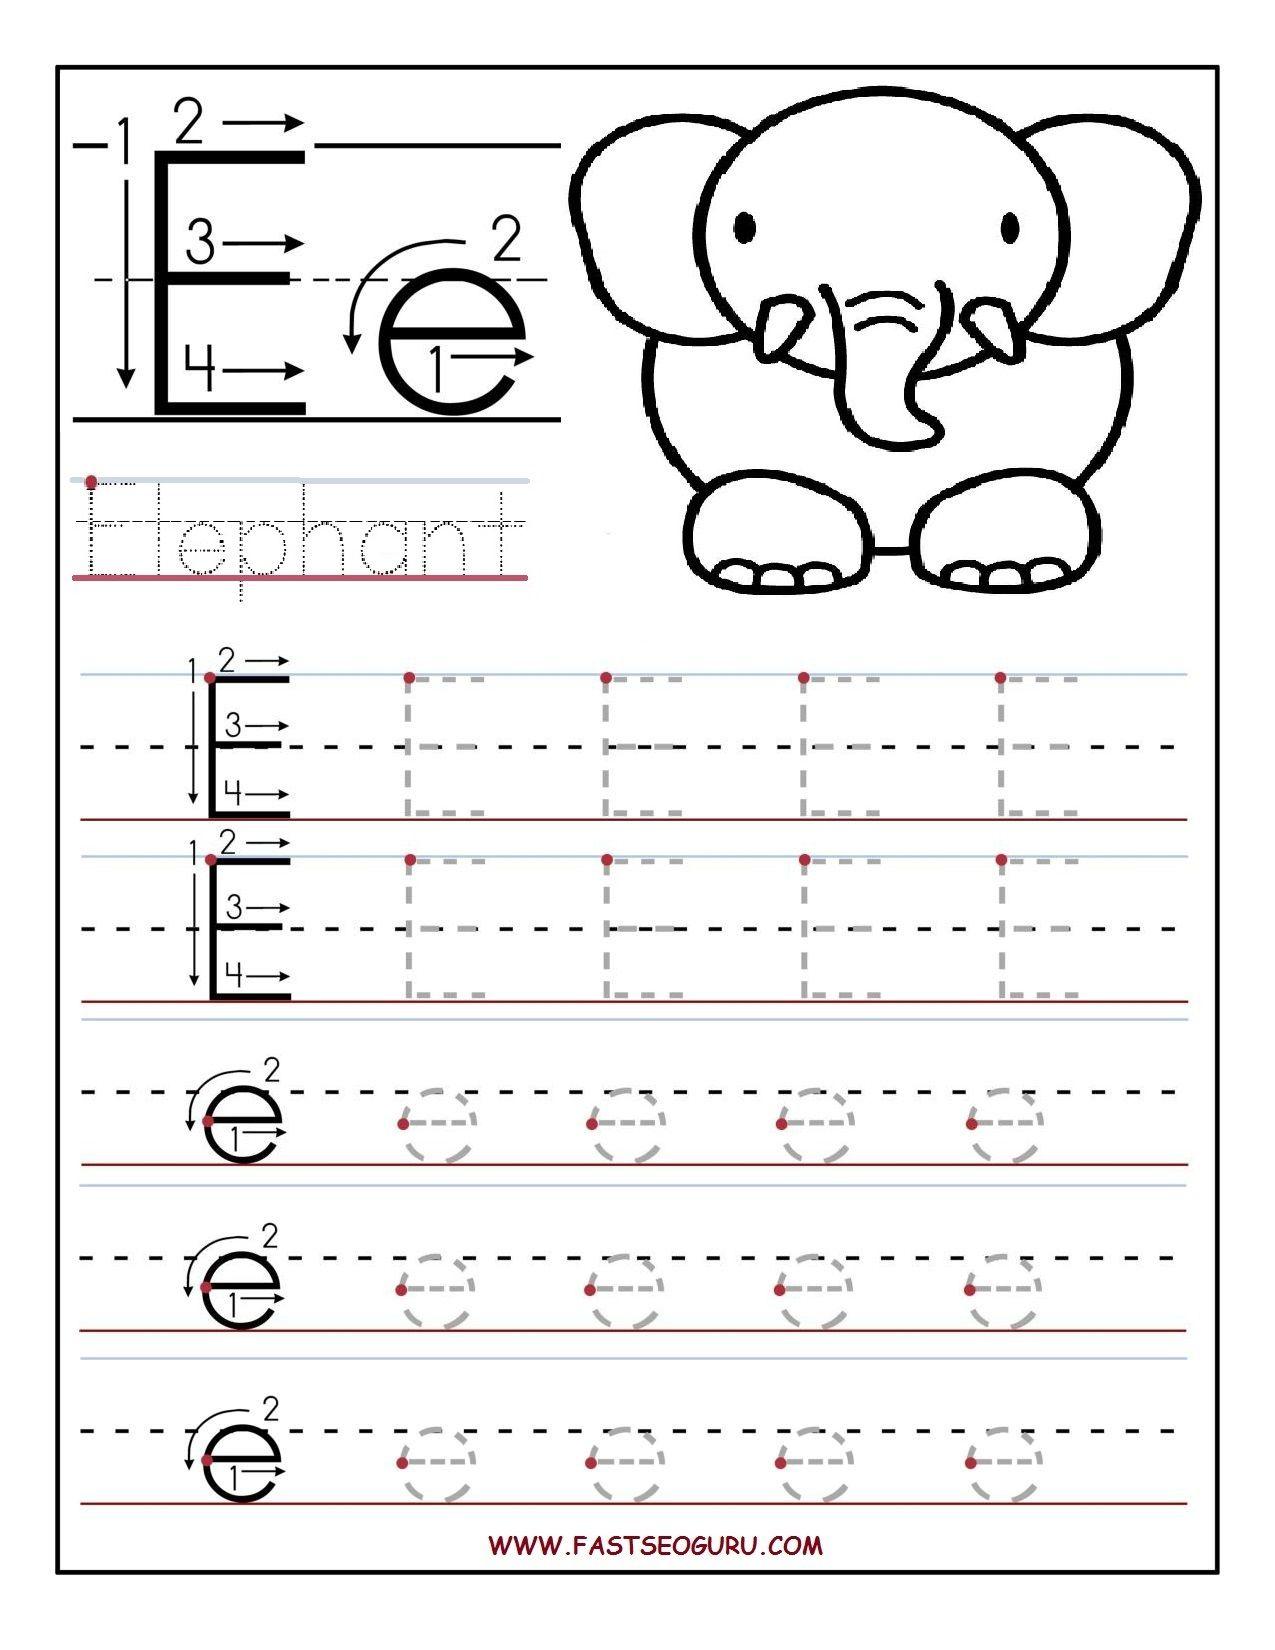 Printable Letter E Tracing Worksheets For Preschool inside E Letter Tracing